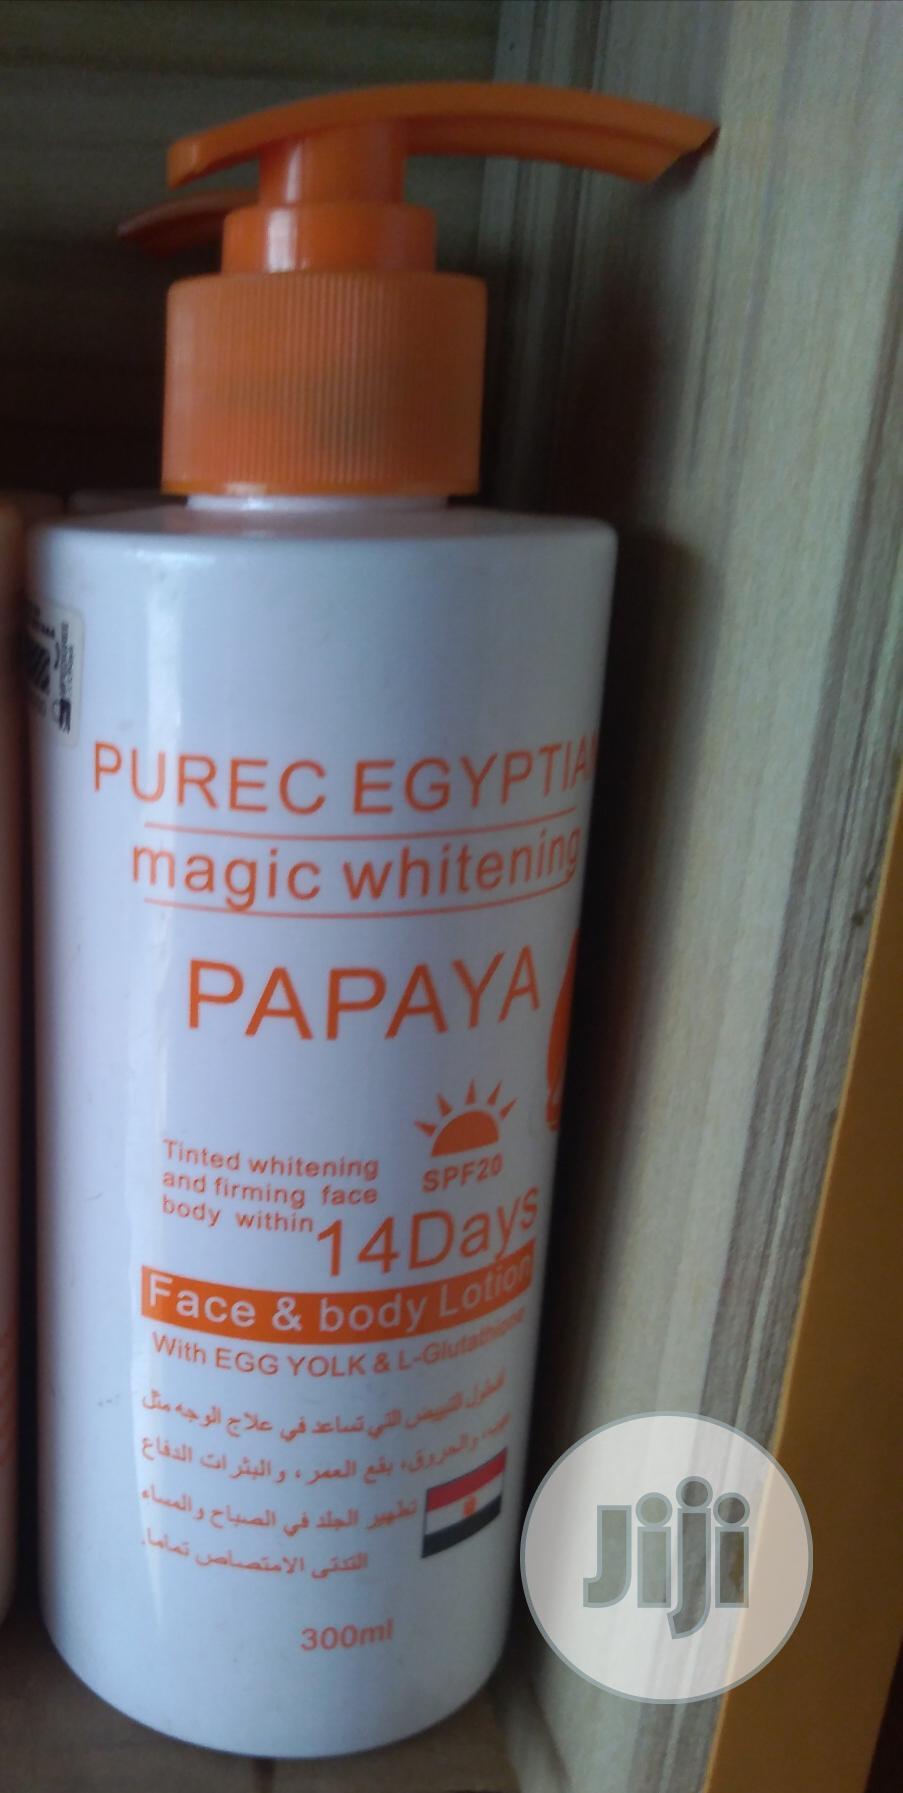 Purec Egyptian Magic Whitening Lotion Papaya